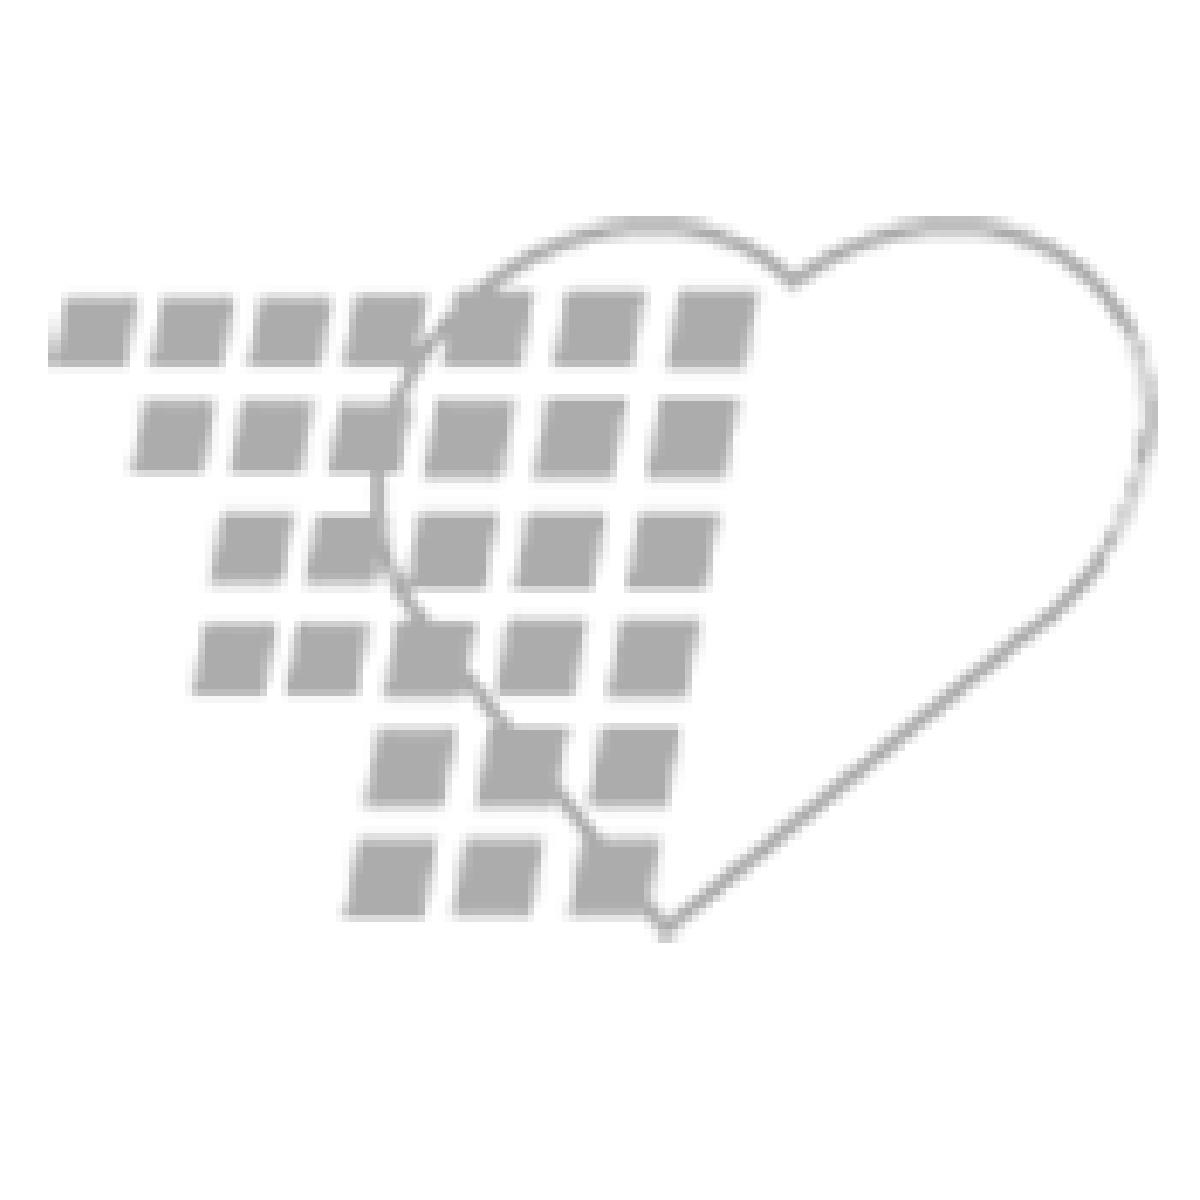 08-10-4464 Sterilization Pouch